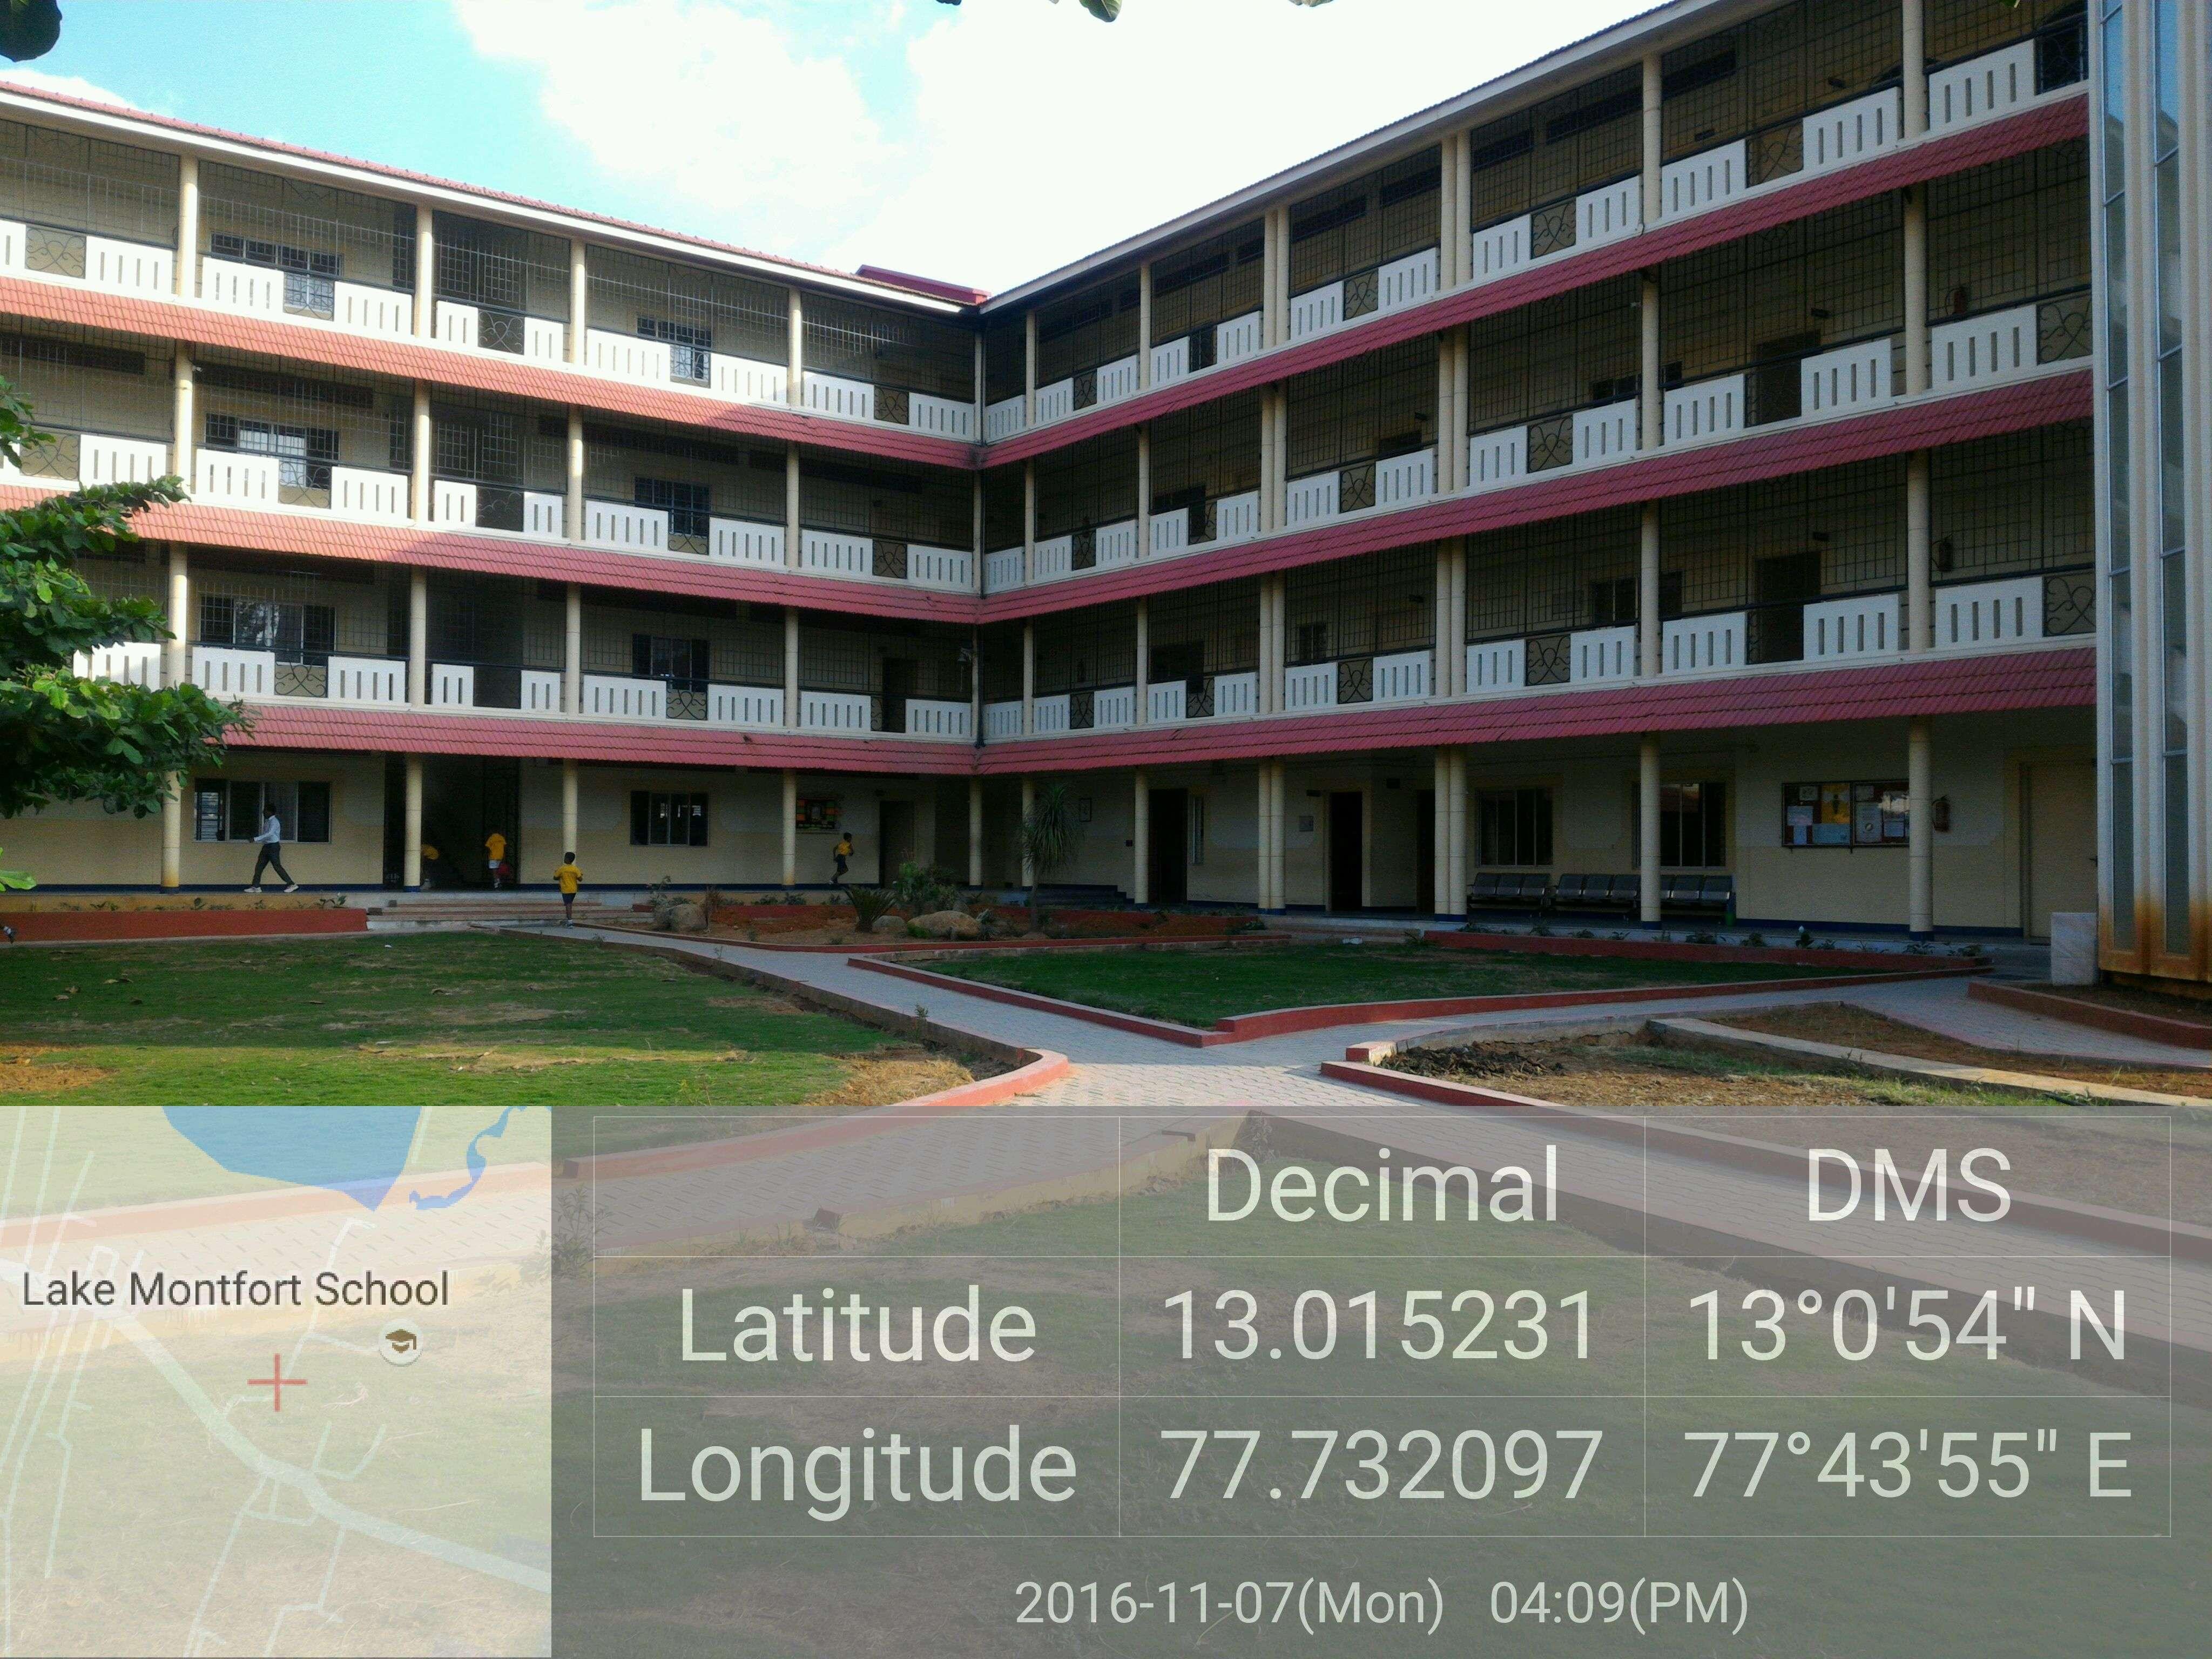 LAKE MONTFORT SCHOOL K S HALLI VIRGONAGAR POST BANGALORE KARNATAKA 830127